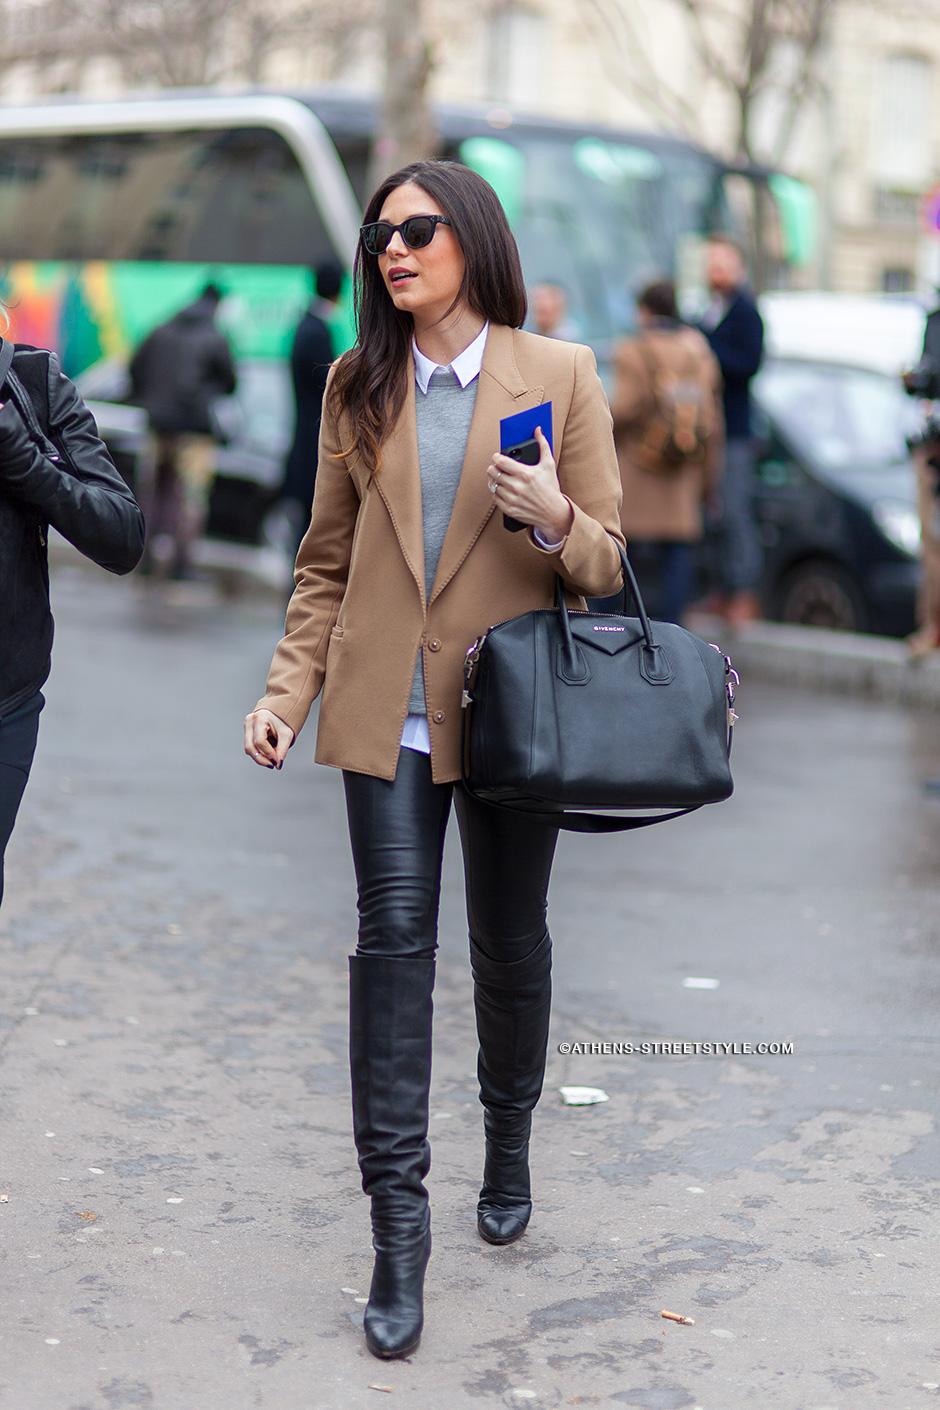 paris-street-style-winter-6334-athens-streetstyle-woman-camel-blazer-leather-pants-paris-fashion-week-fall-winter-2014-2015-street-style-1.jpg